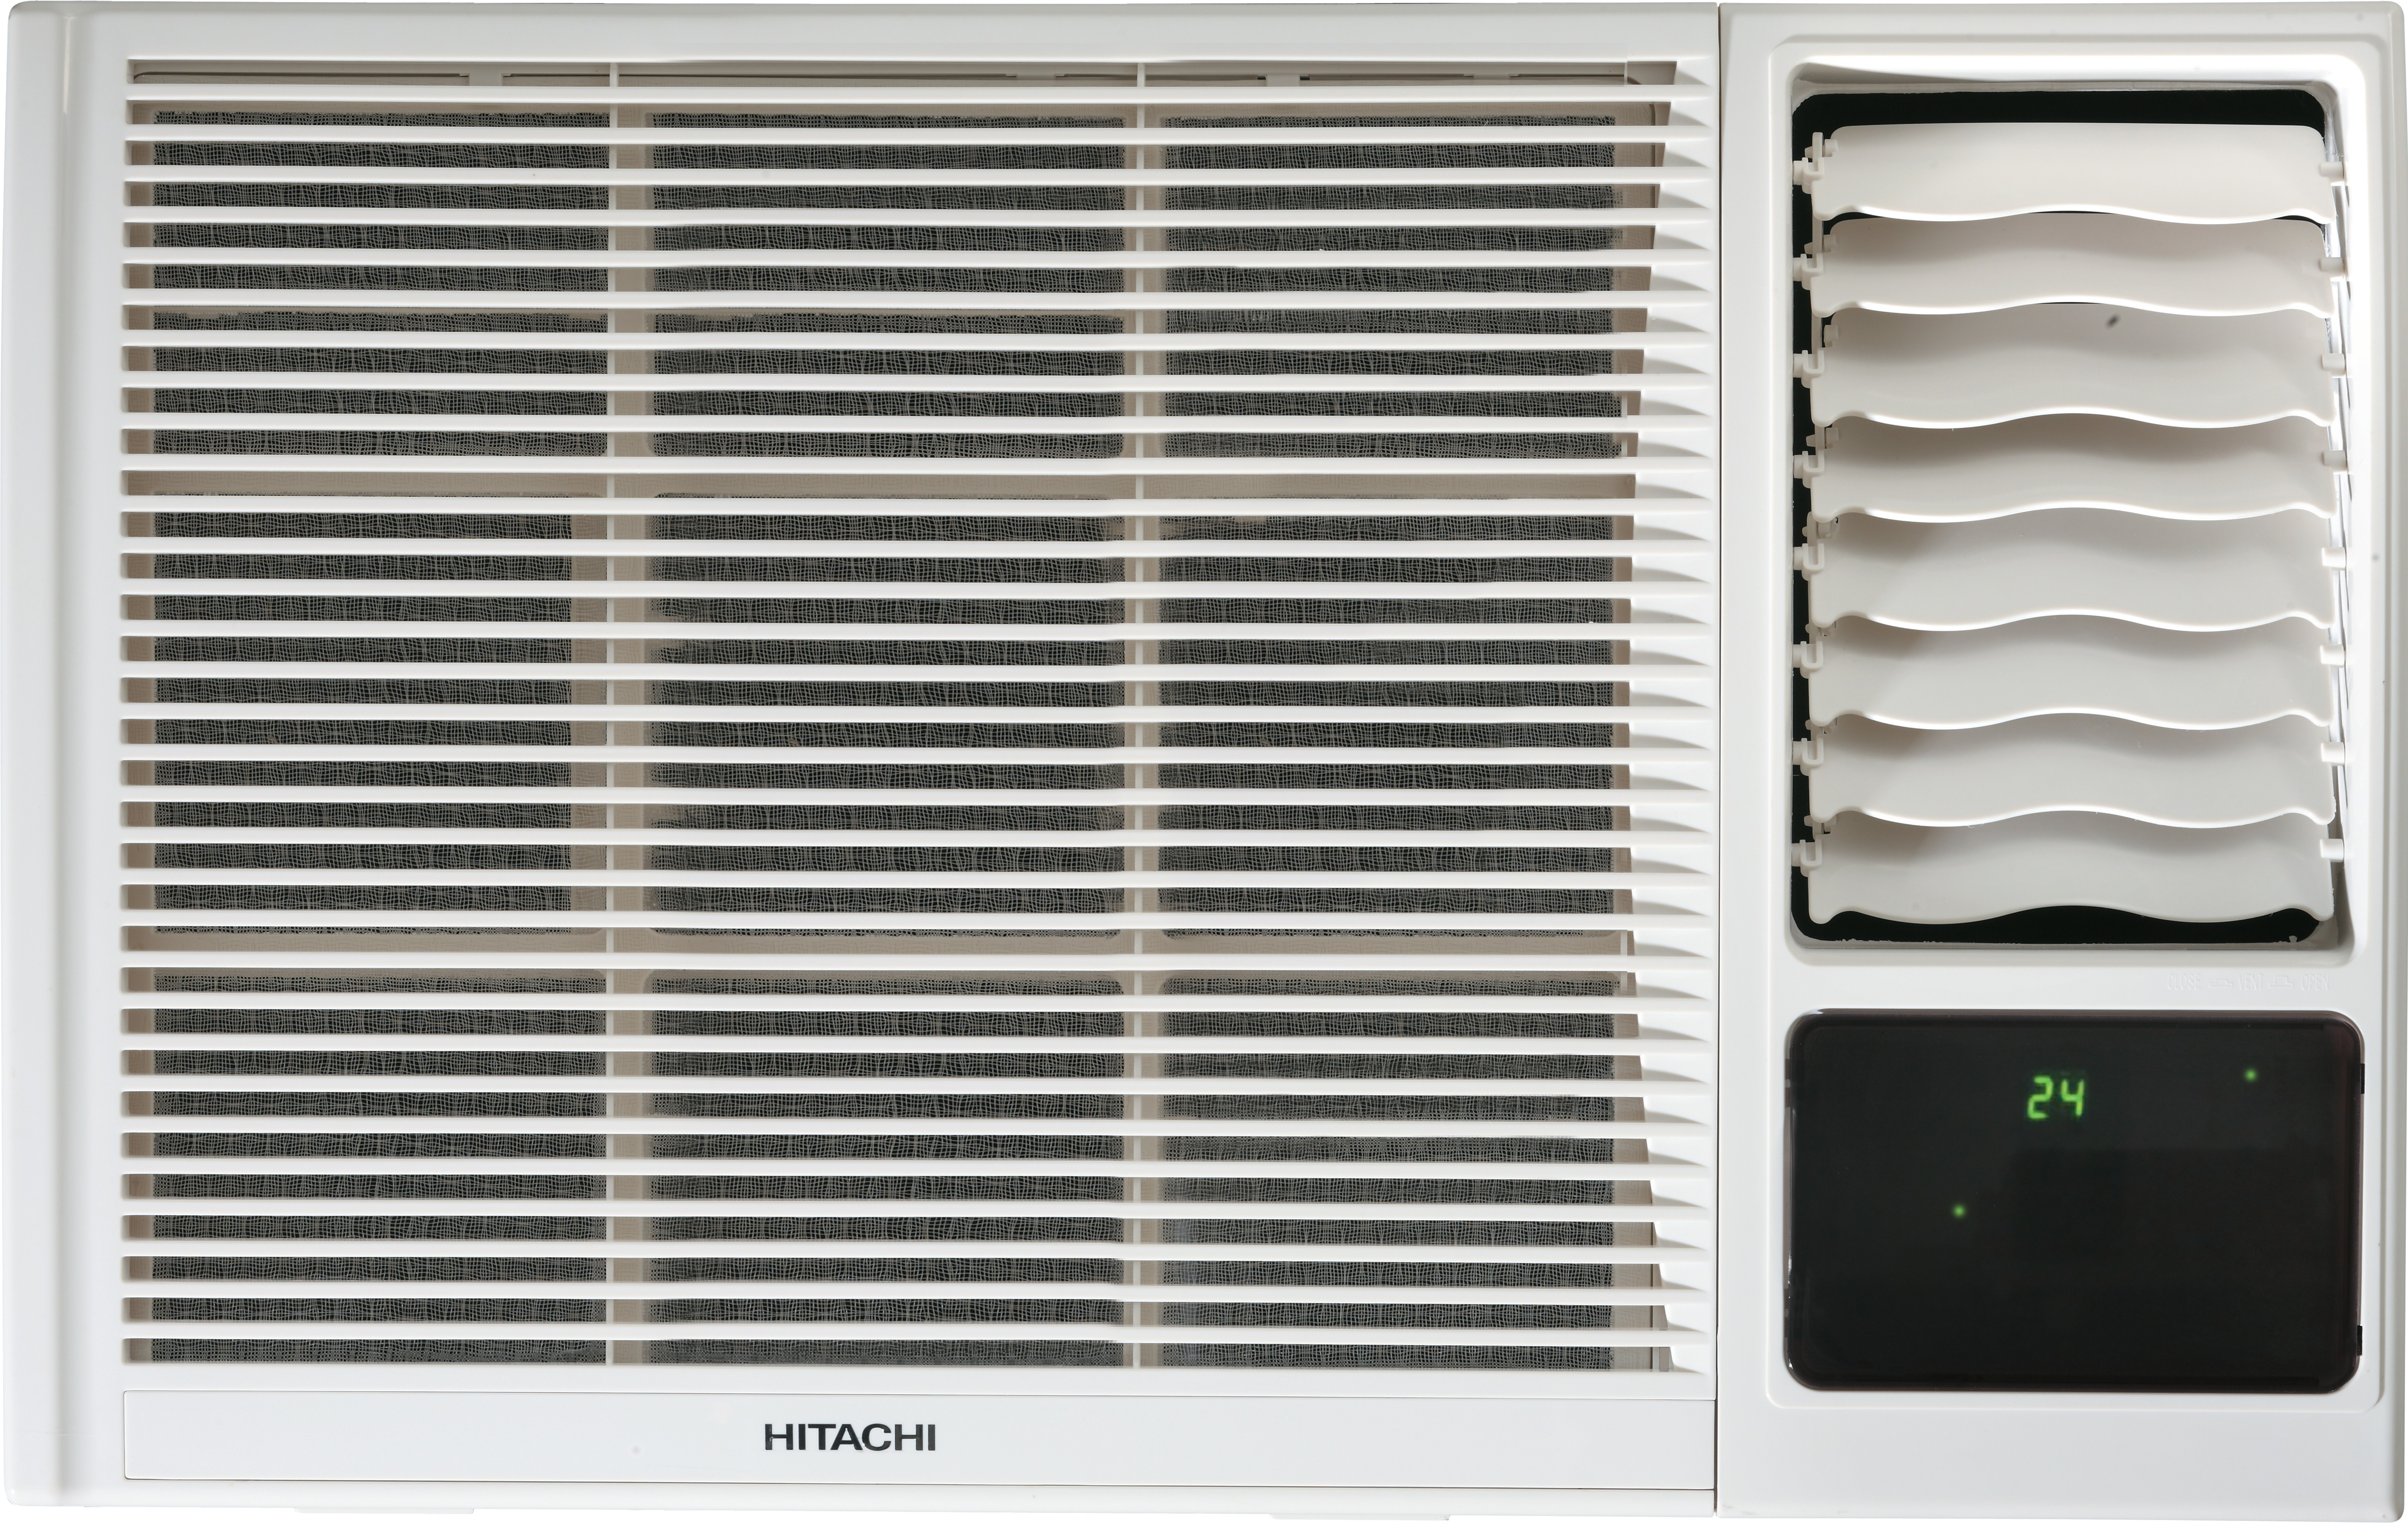 Hitachi 1.5 Ton 3 Star Window AC  - White(RAW318KXDAI, Copper Condenser) (Hitachi)  Buy Online